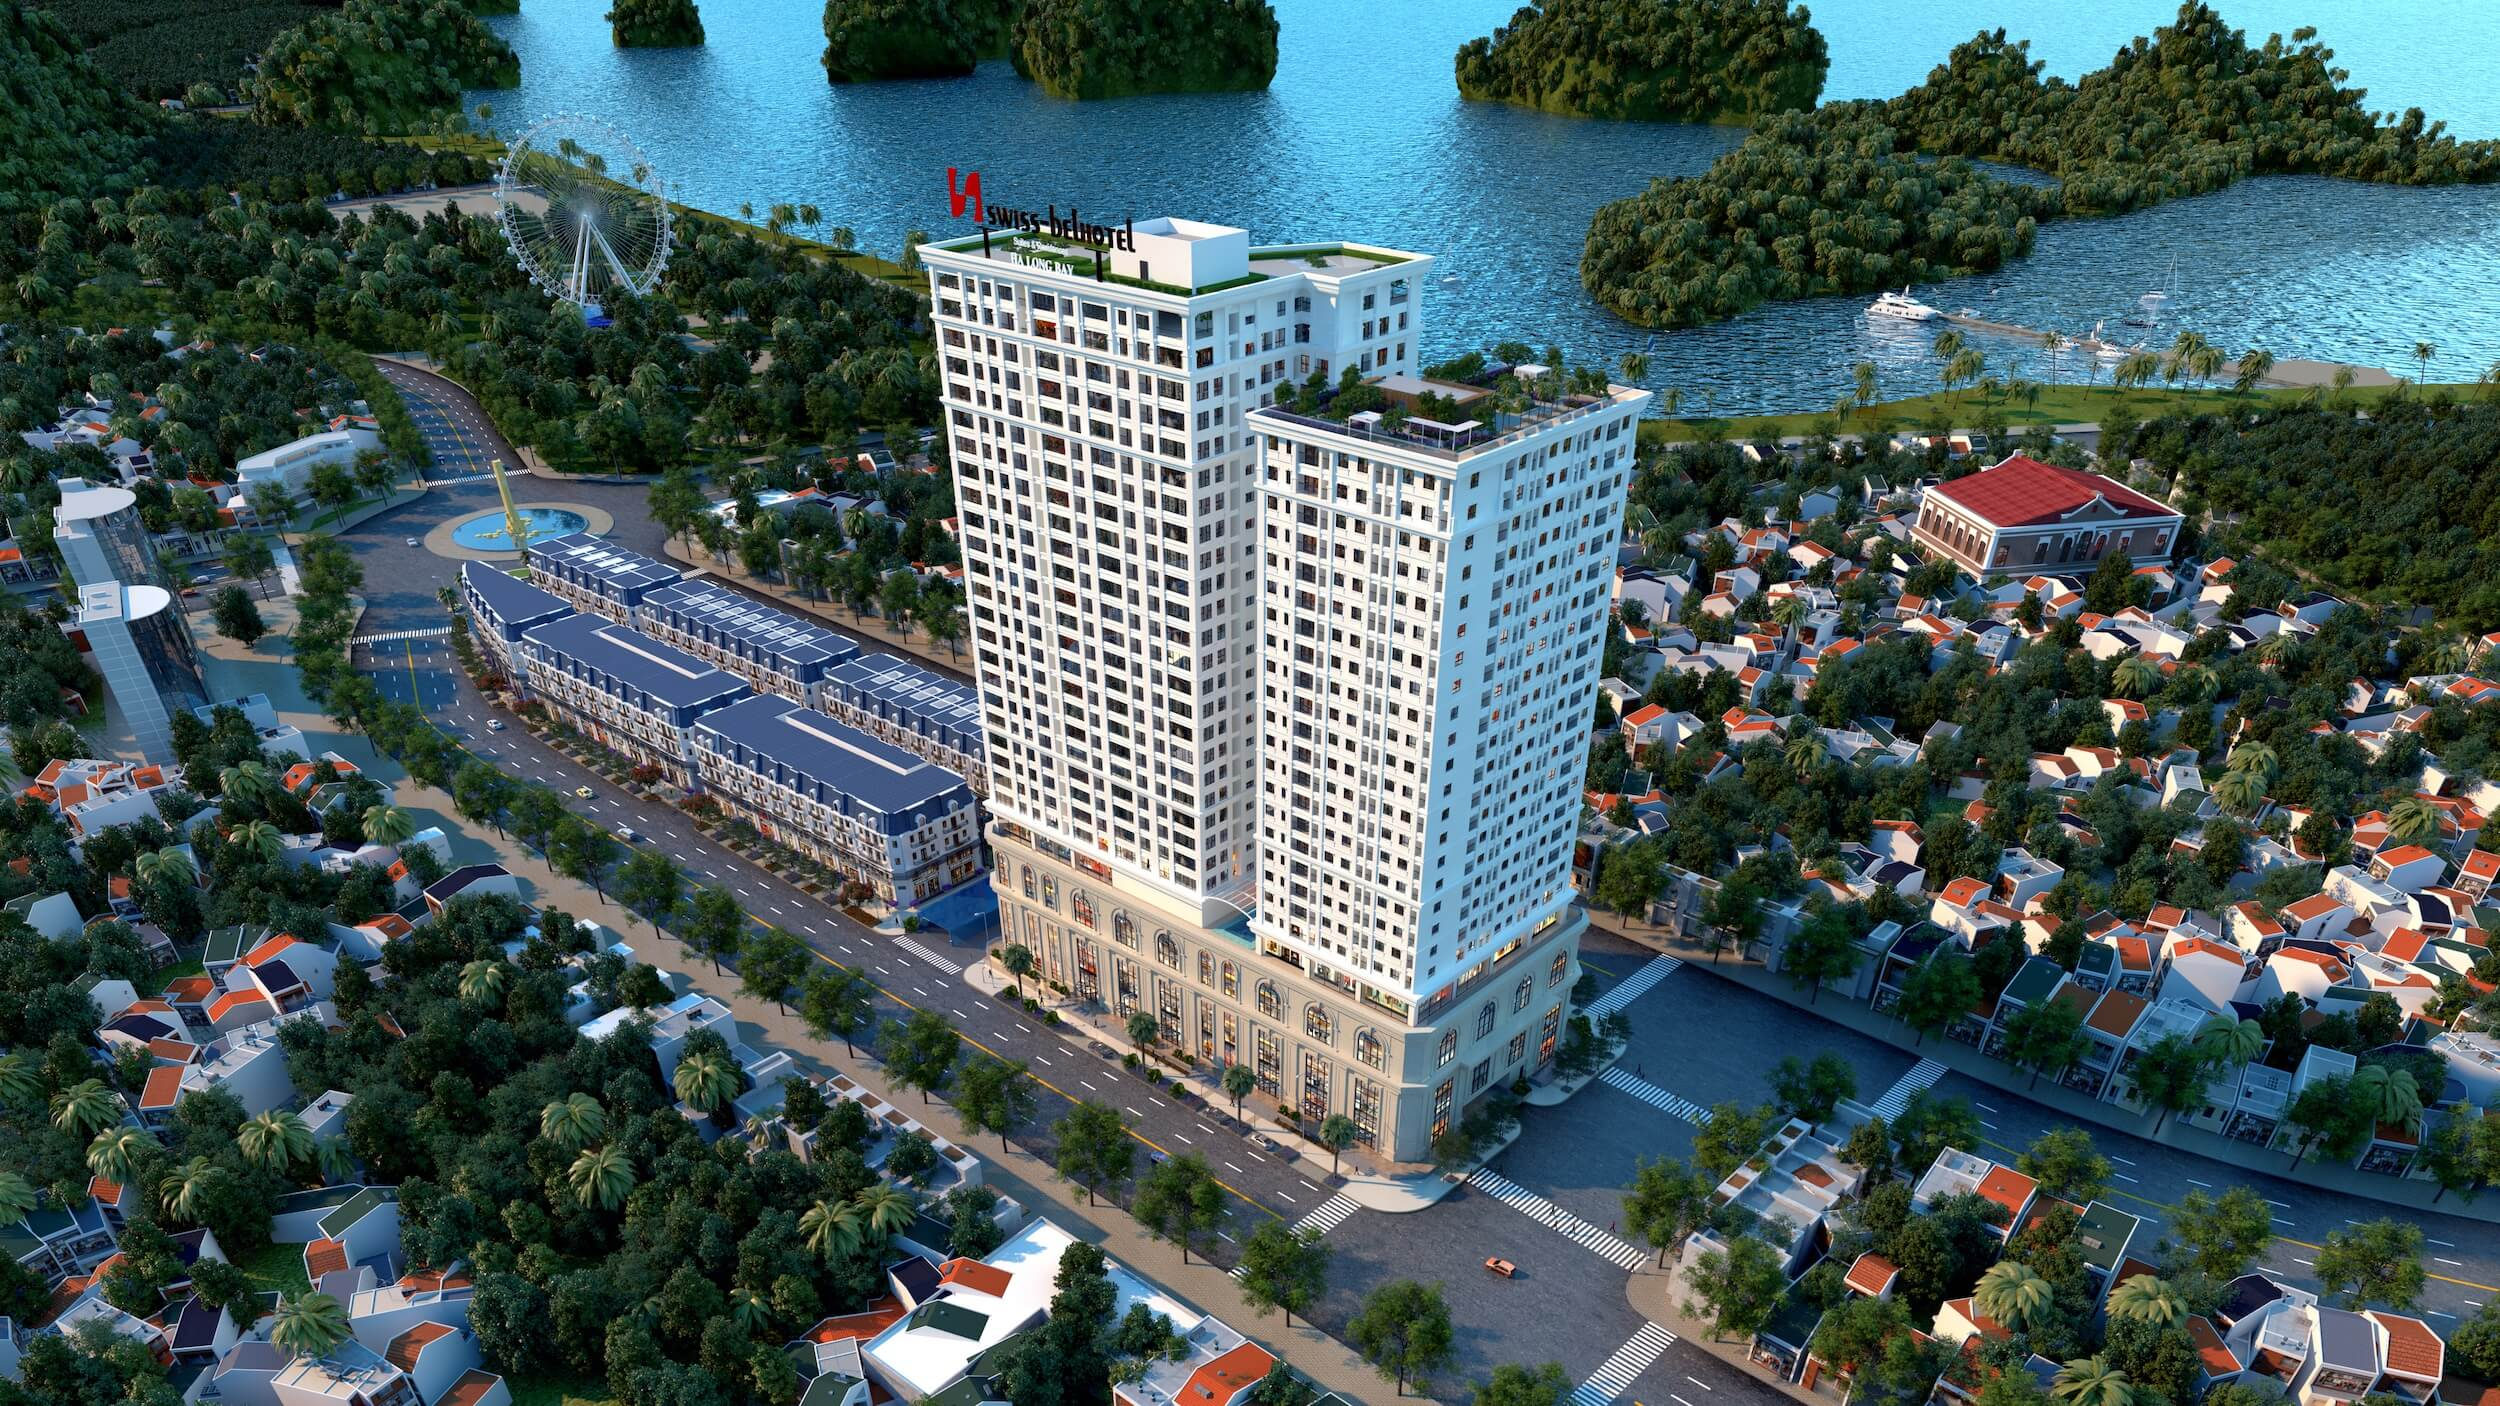 Swiss-Belhotel International unveils ambitious expansion plans in Vietnam